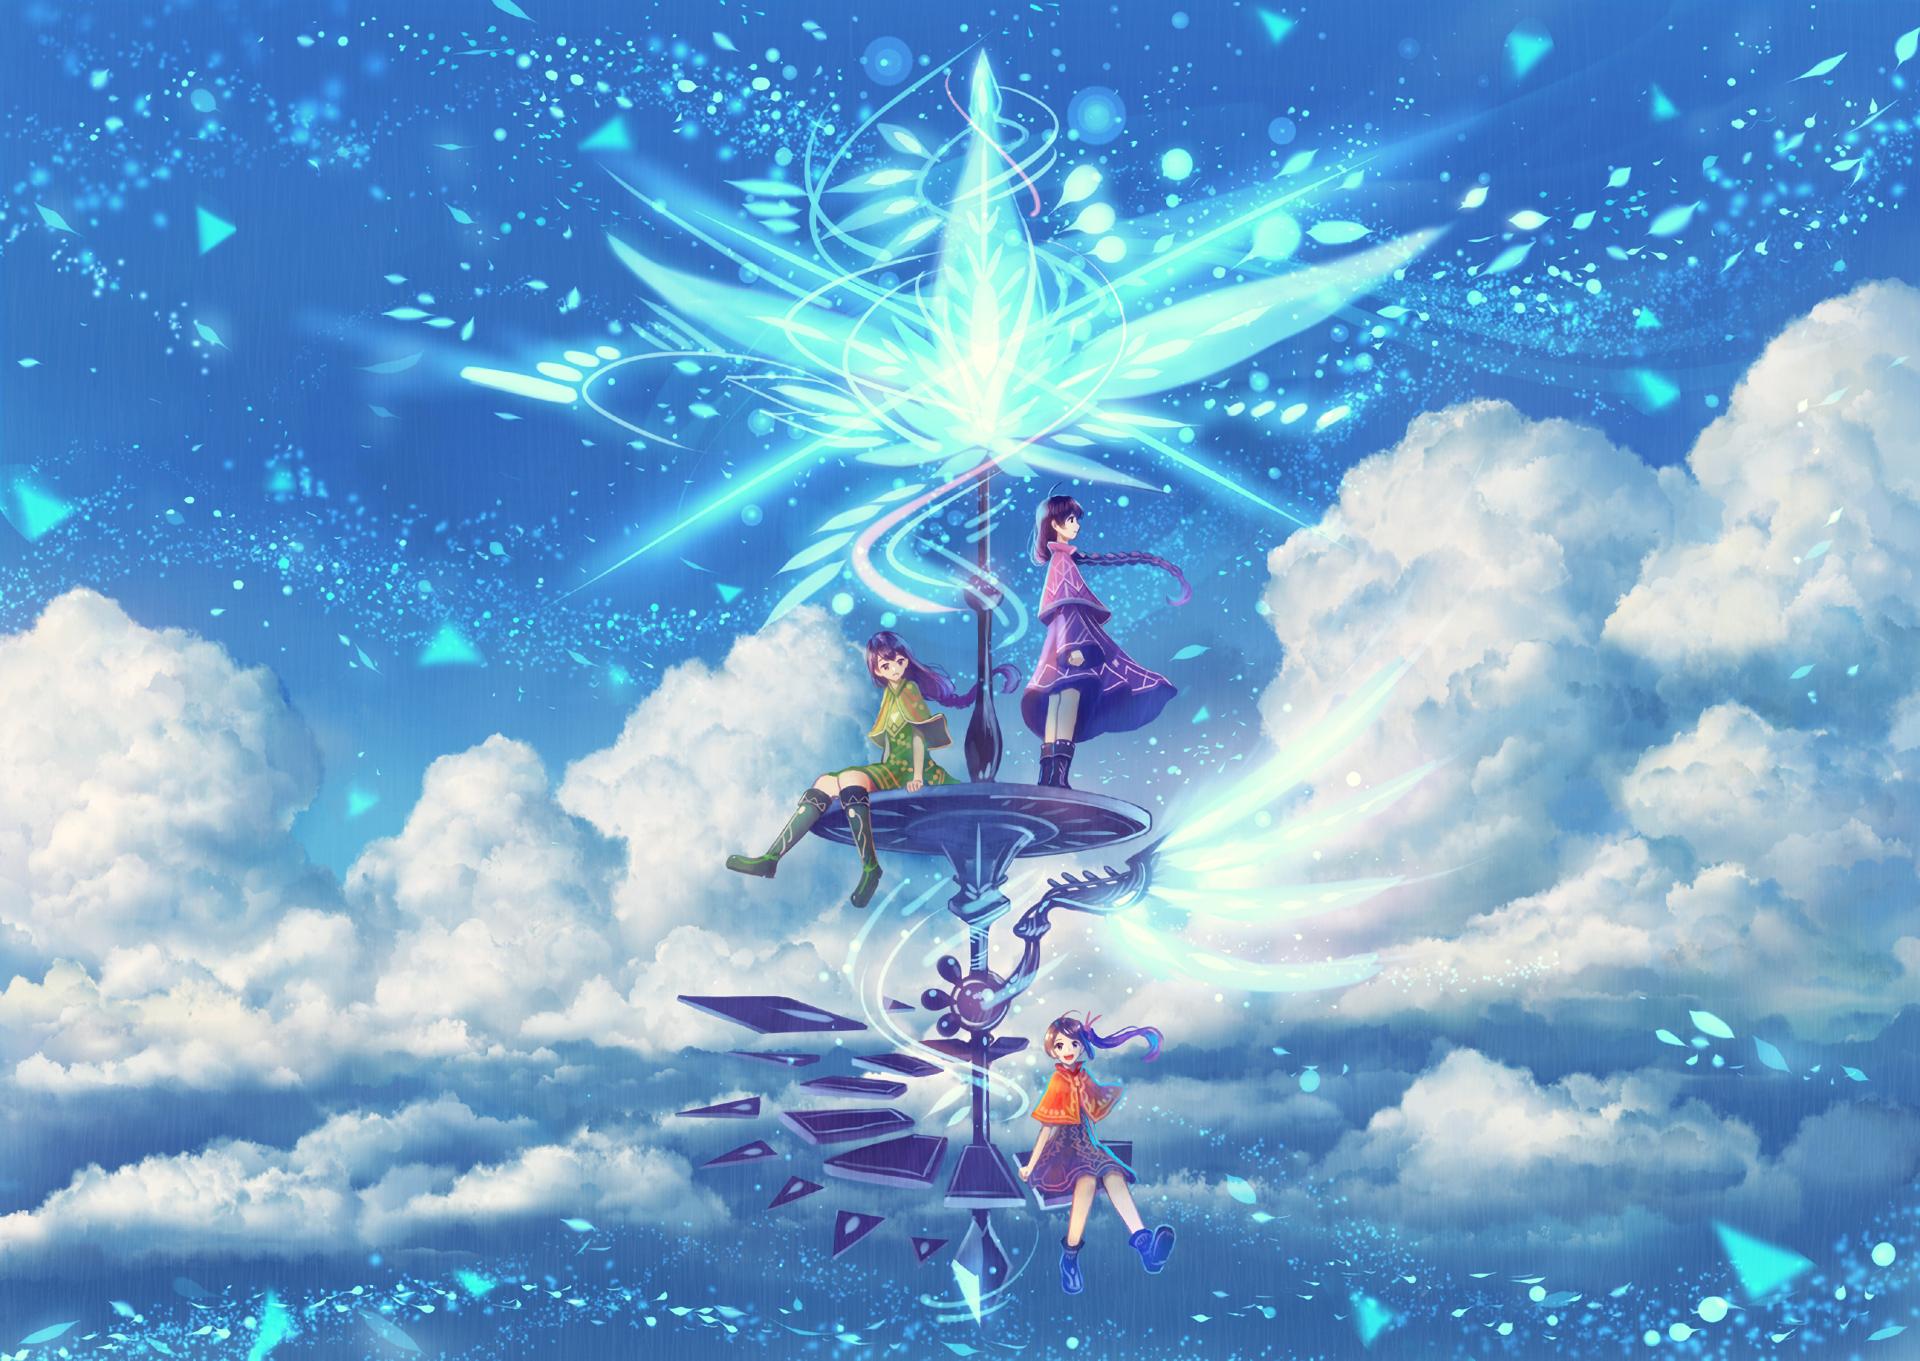 Anime - Original  Sky Cloud Girl Purple Hair Boots Braid Ponytail Wallpaper